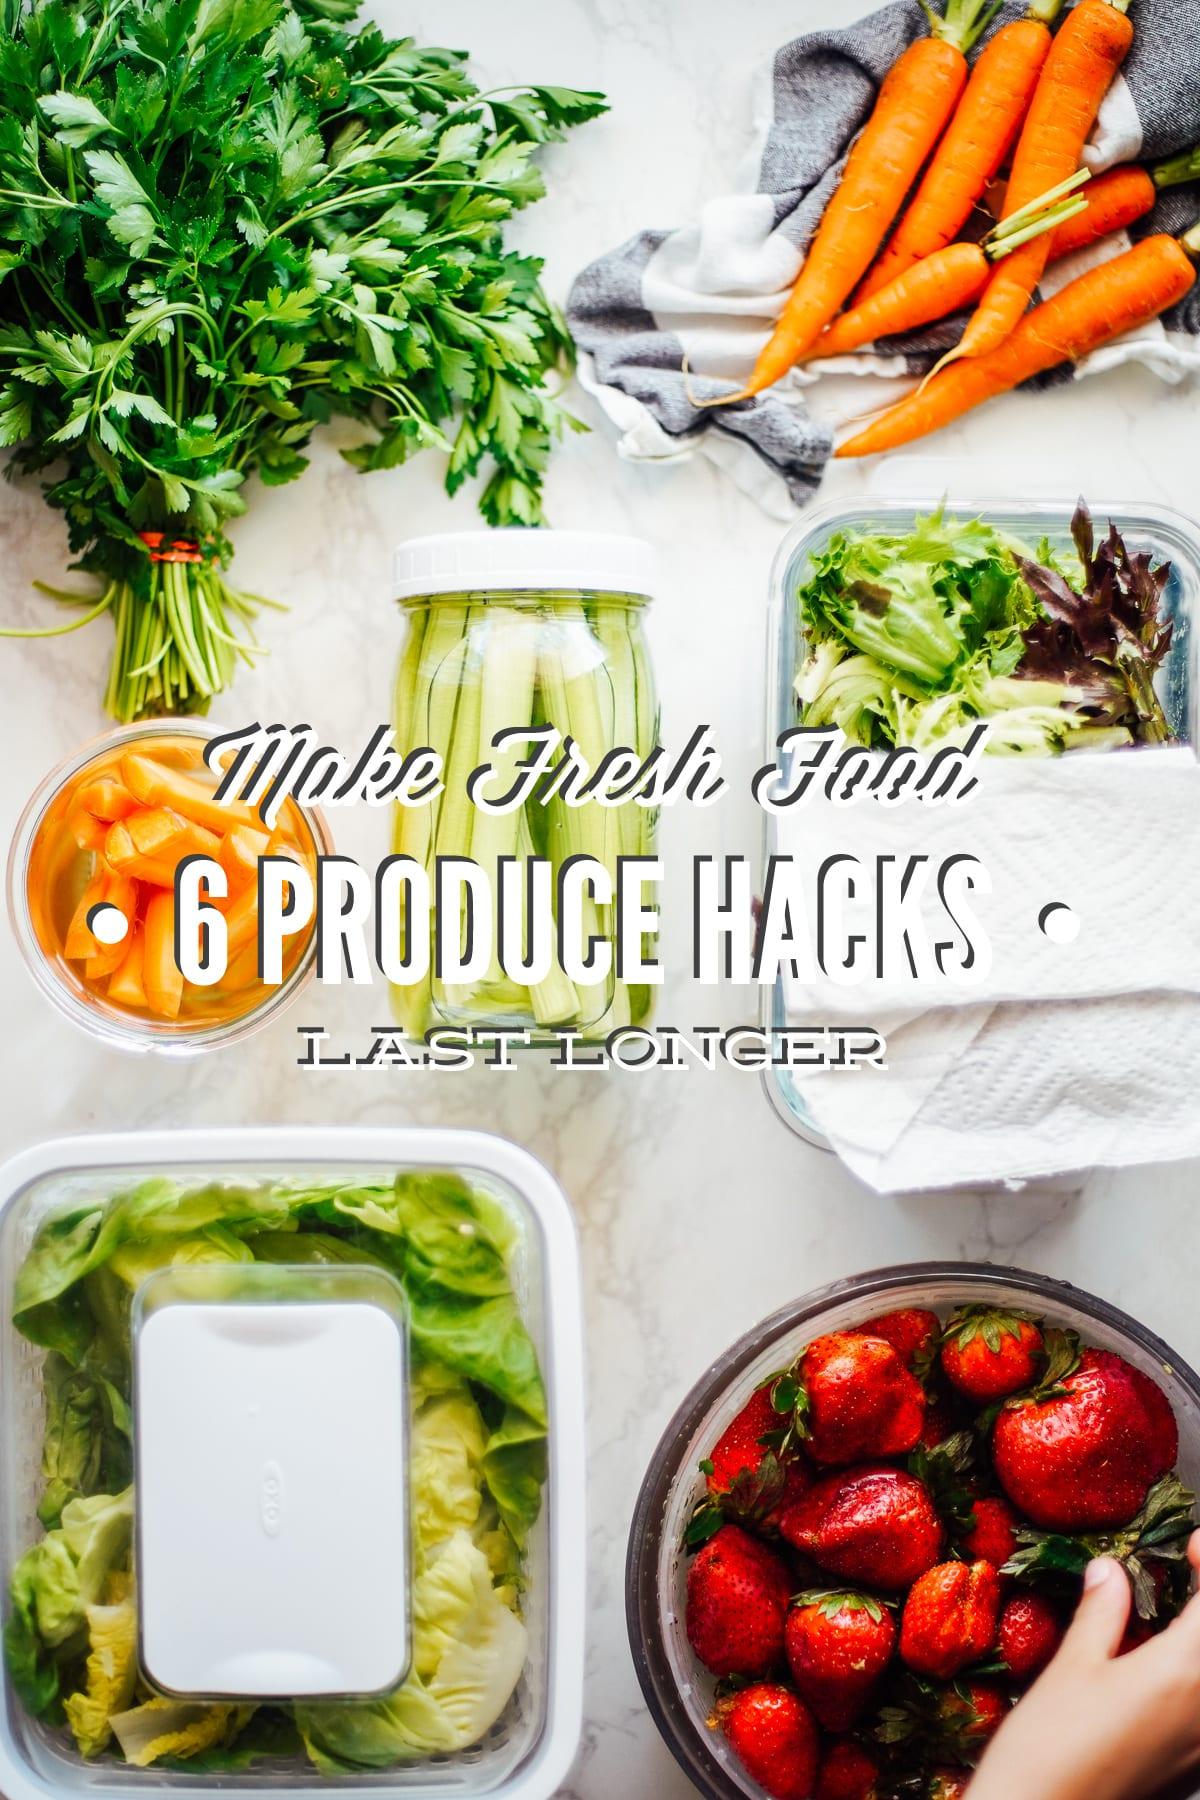 Produce Hacks Make Fresh Food Last Longer